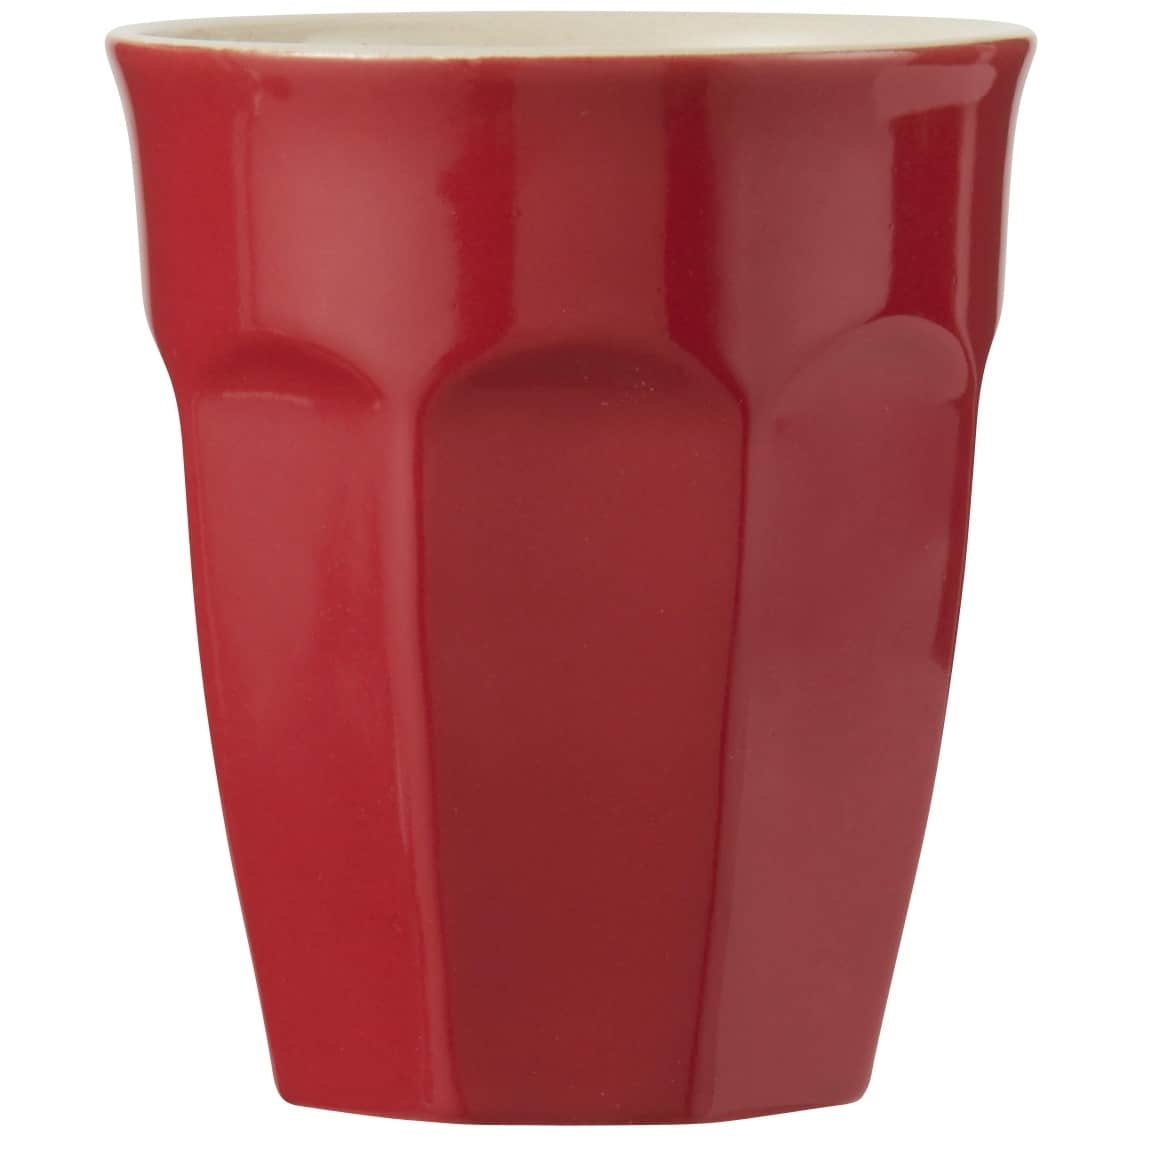 IB LAURSEN Latte hrneček Mynte red 250 ml, červená barva, keramika